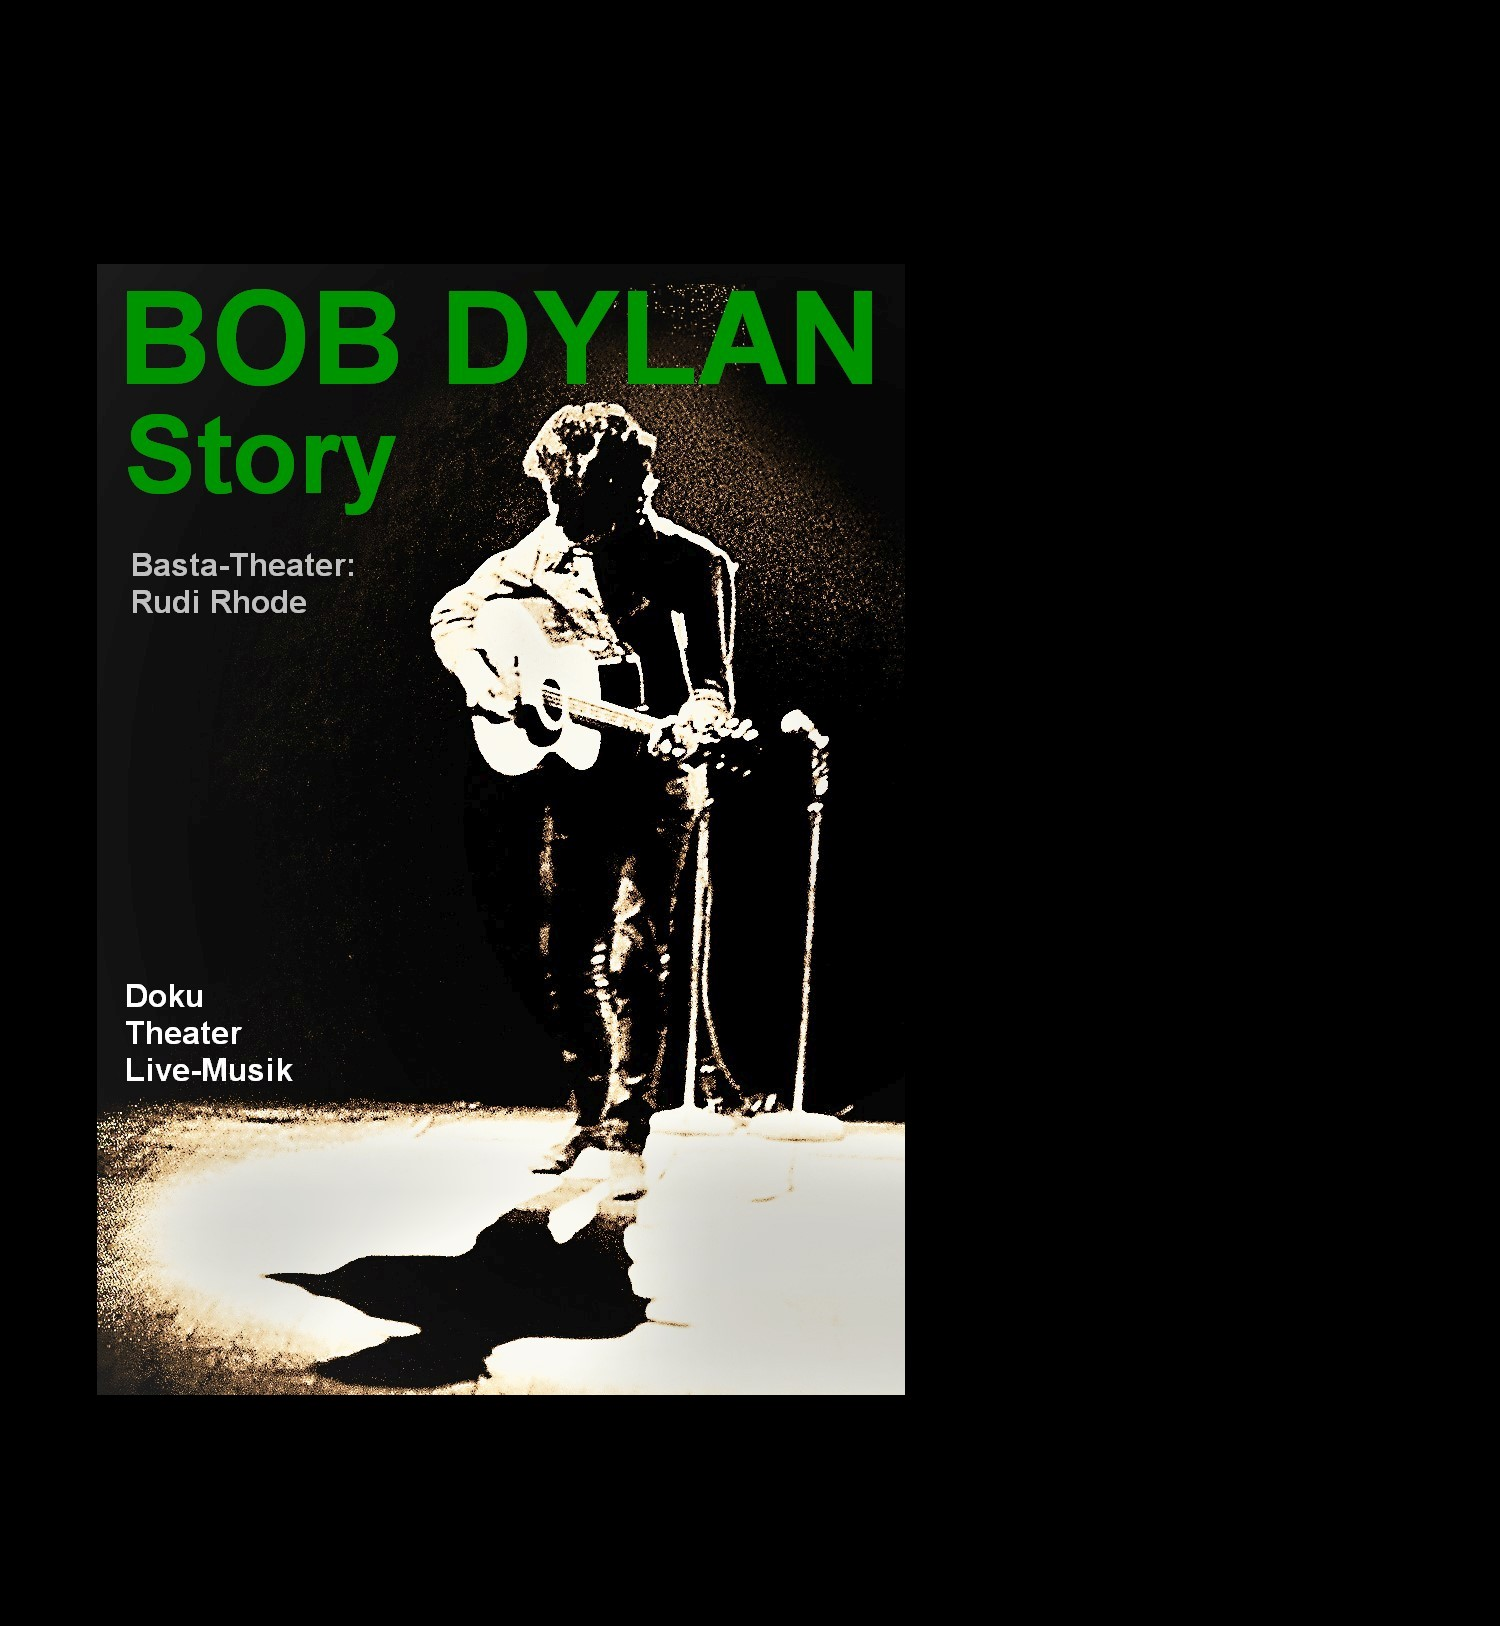 """Die Bob Dylan-Story"" - Doku-Theater-Livemusik mit dem Basta-Theater Rudi Rhode"